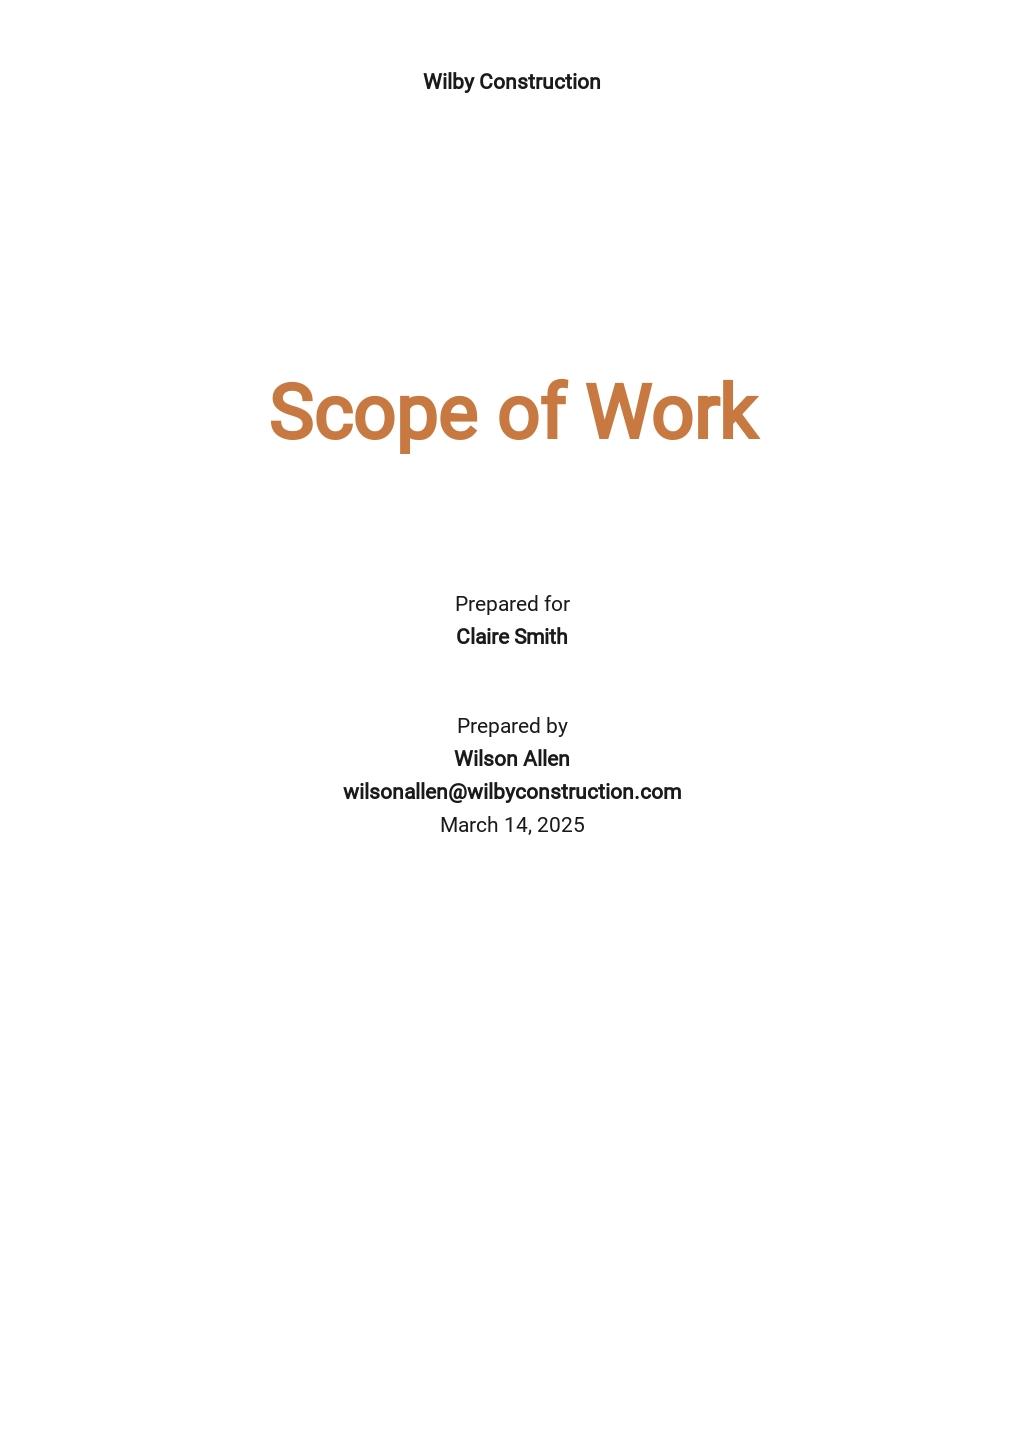 Blank Scope of Work Template